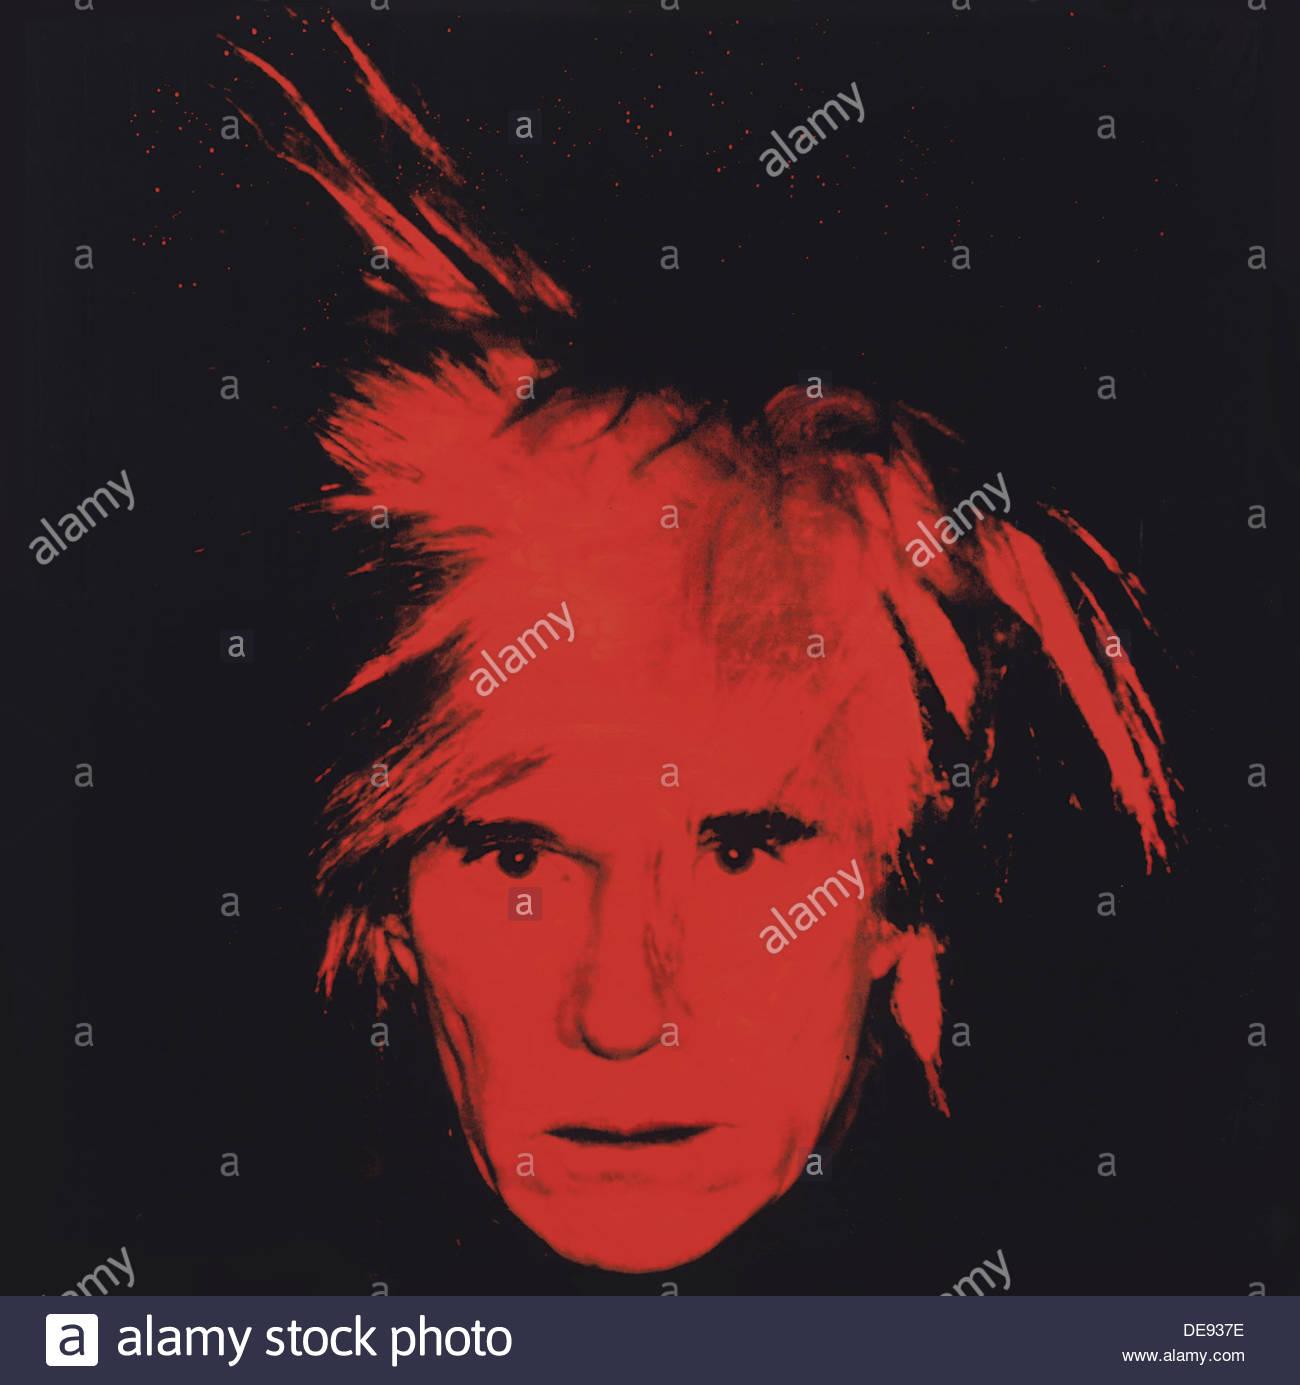 Self-Portrait, 1986. Artist: Warhol, Andy (1928-1987) - Stock Image